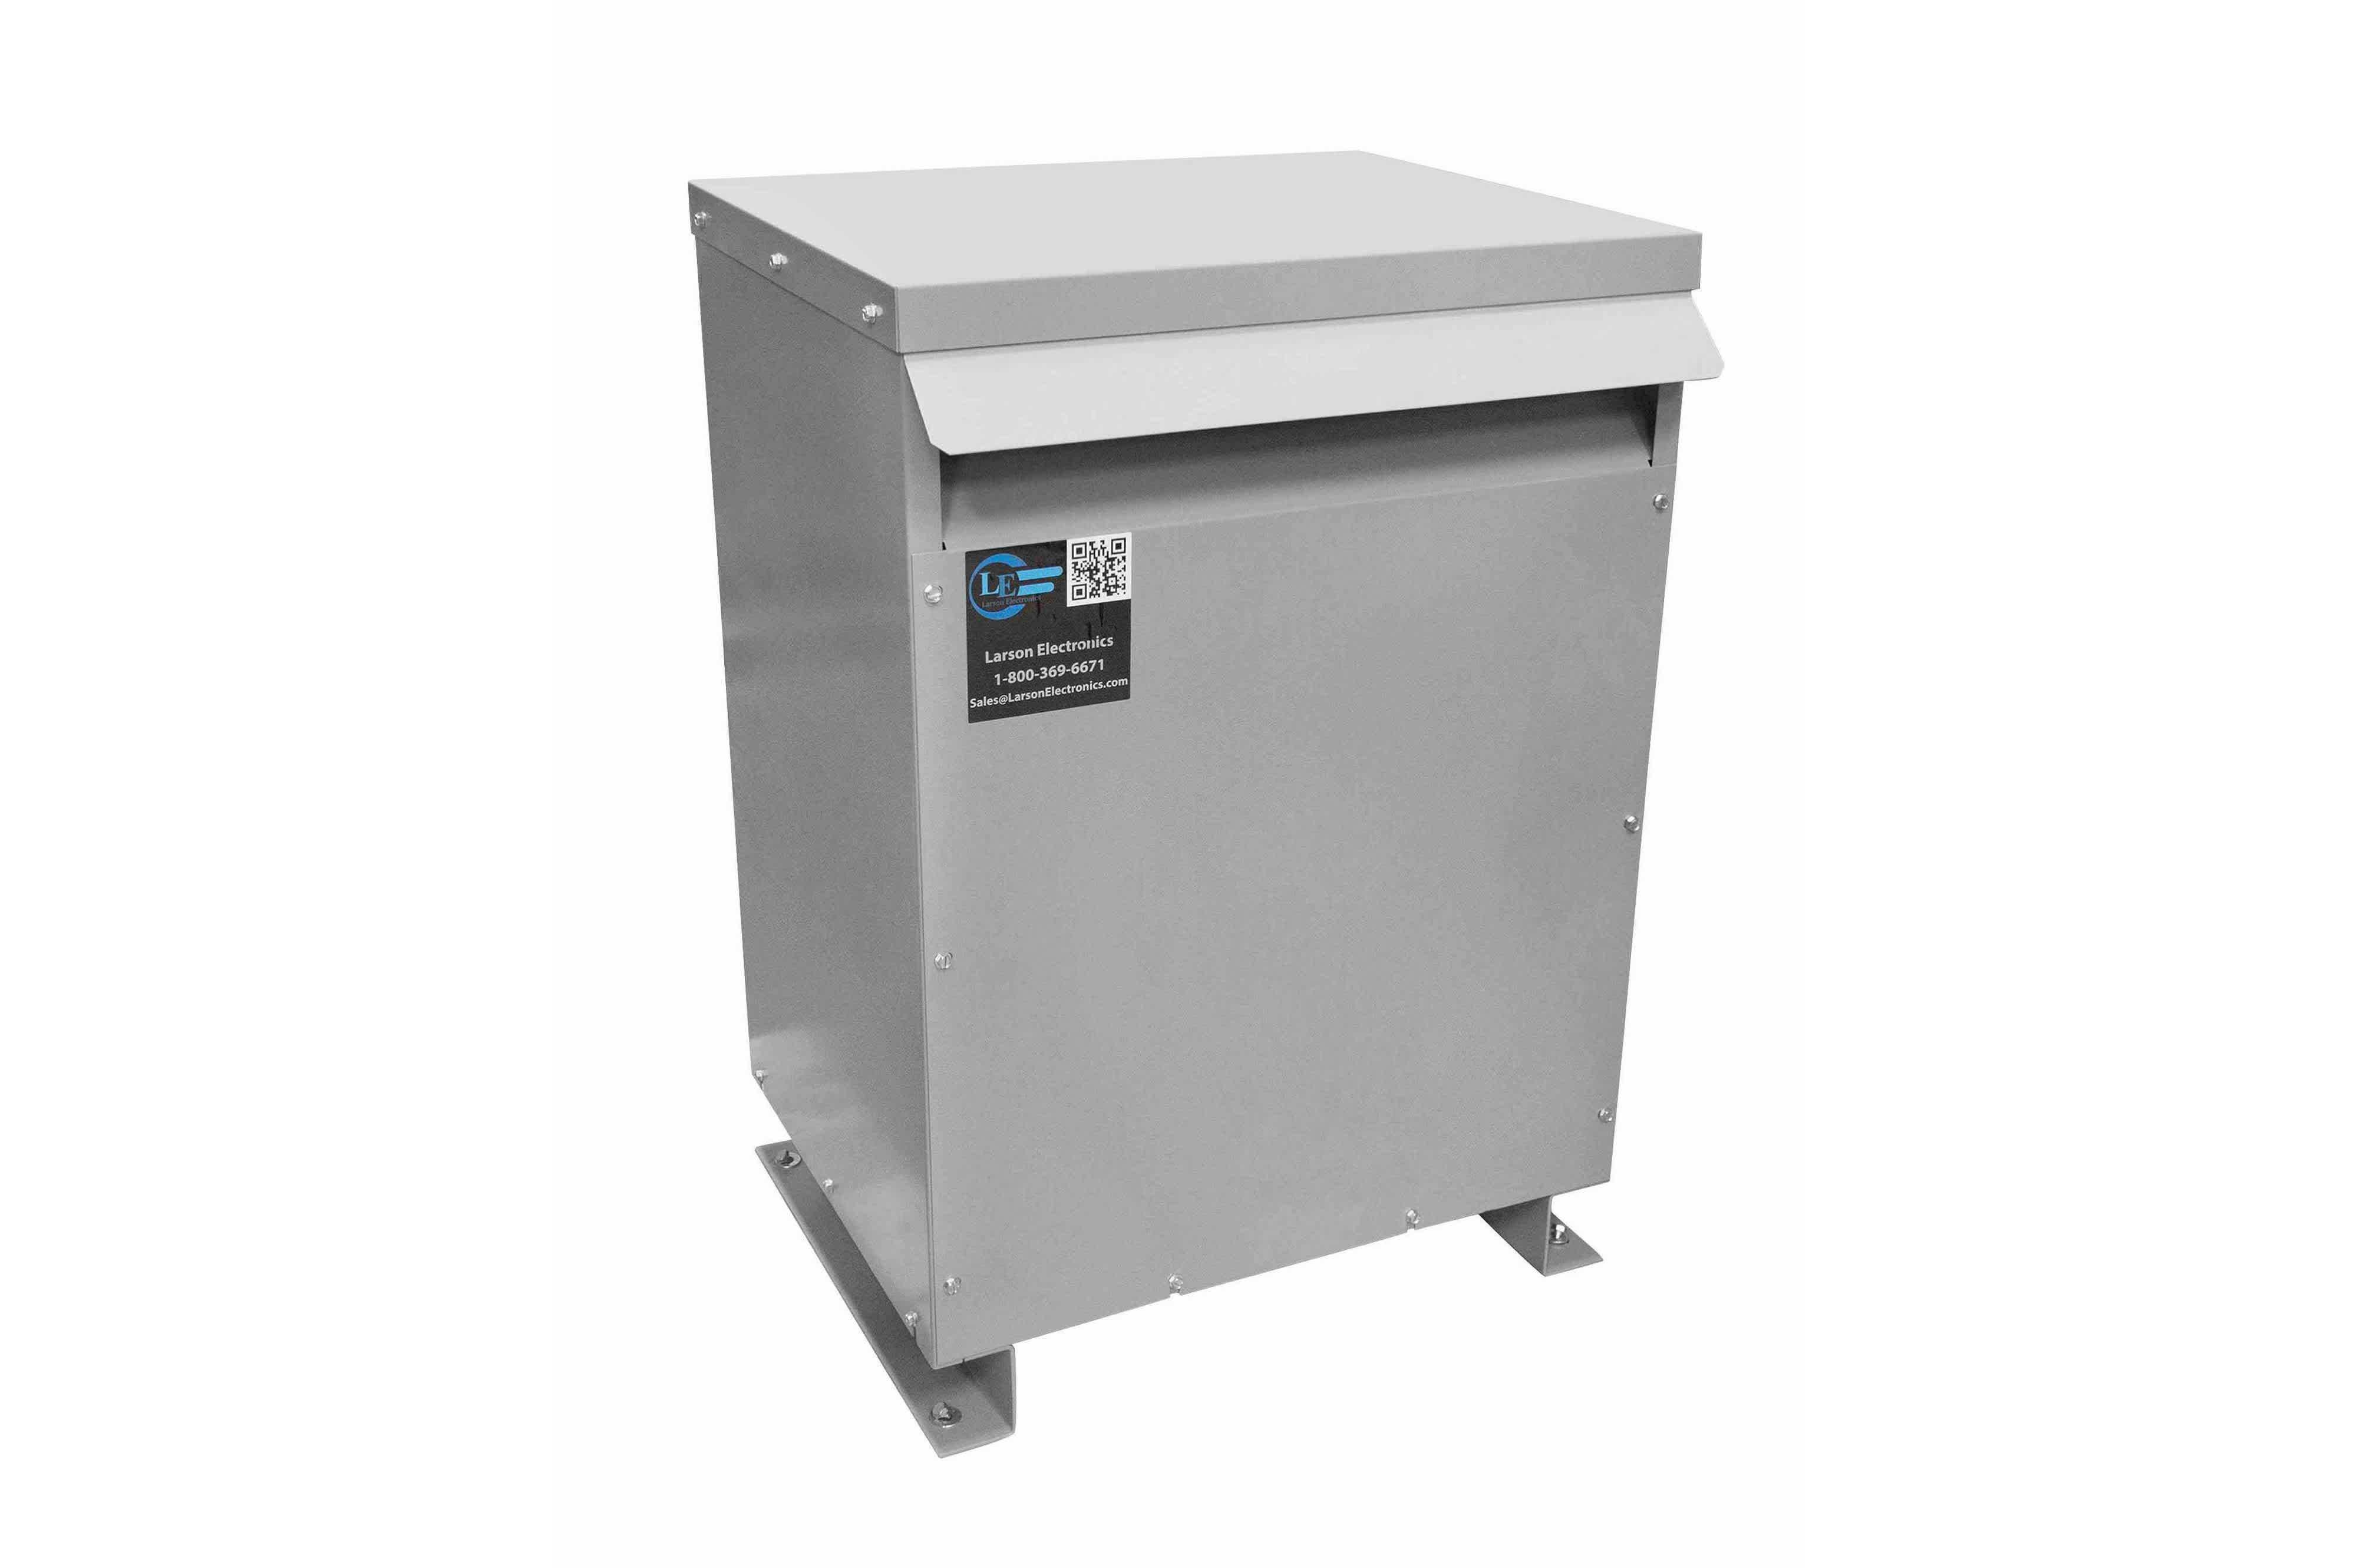 10 kVA 3PH Isolation Transformer, 220V Wye Primary, 480Y/277 Wye-N Secondary, N3R, Ventilated, 60 Hz